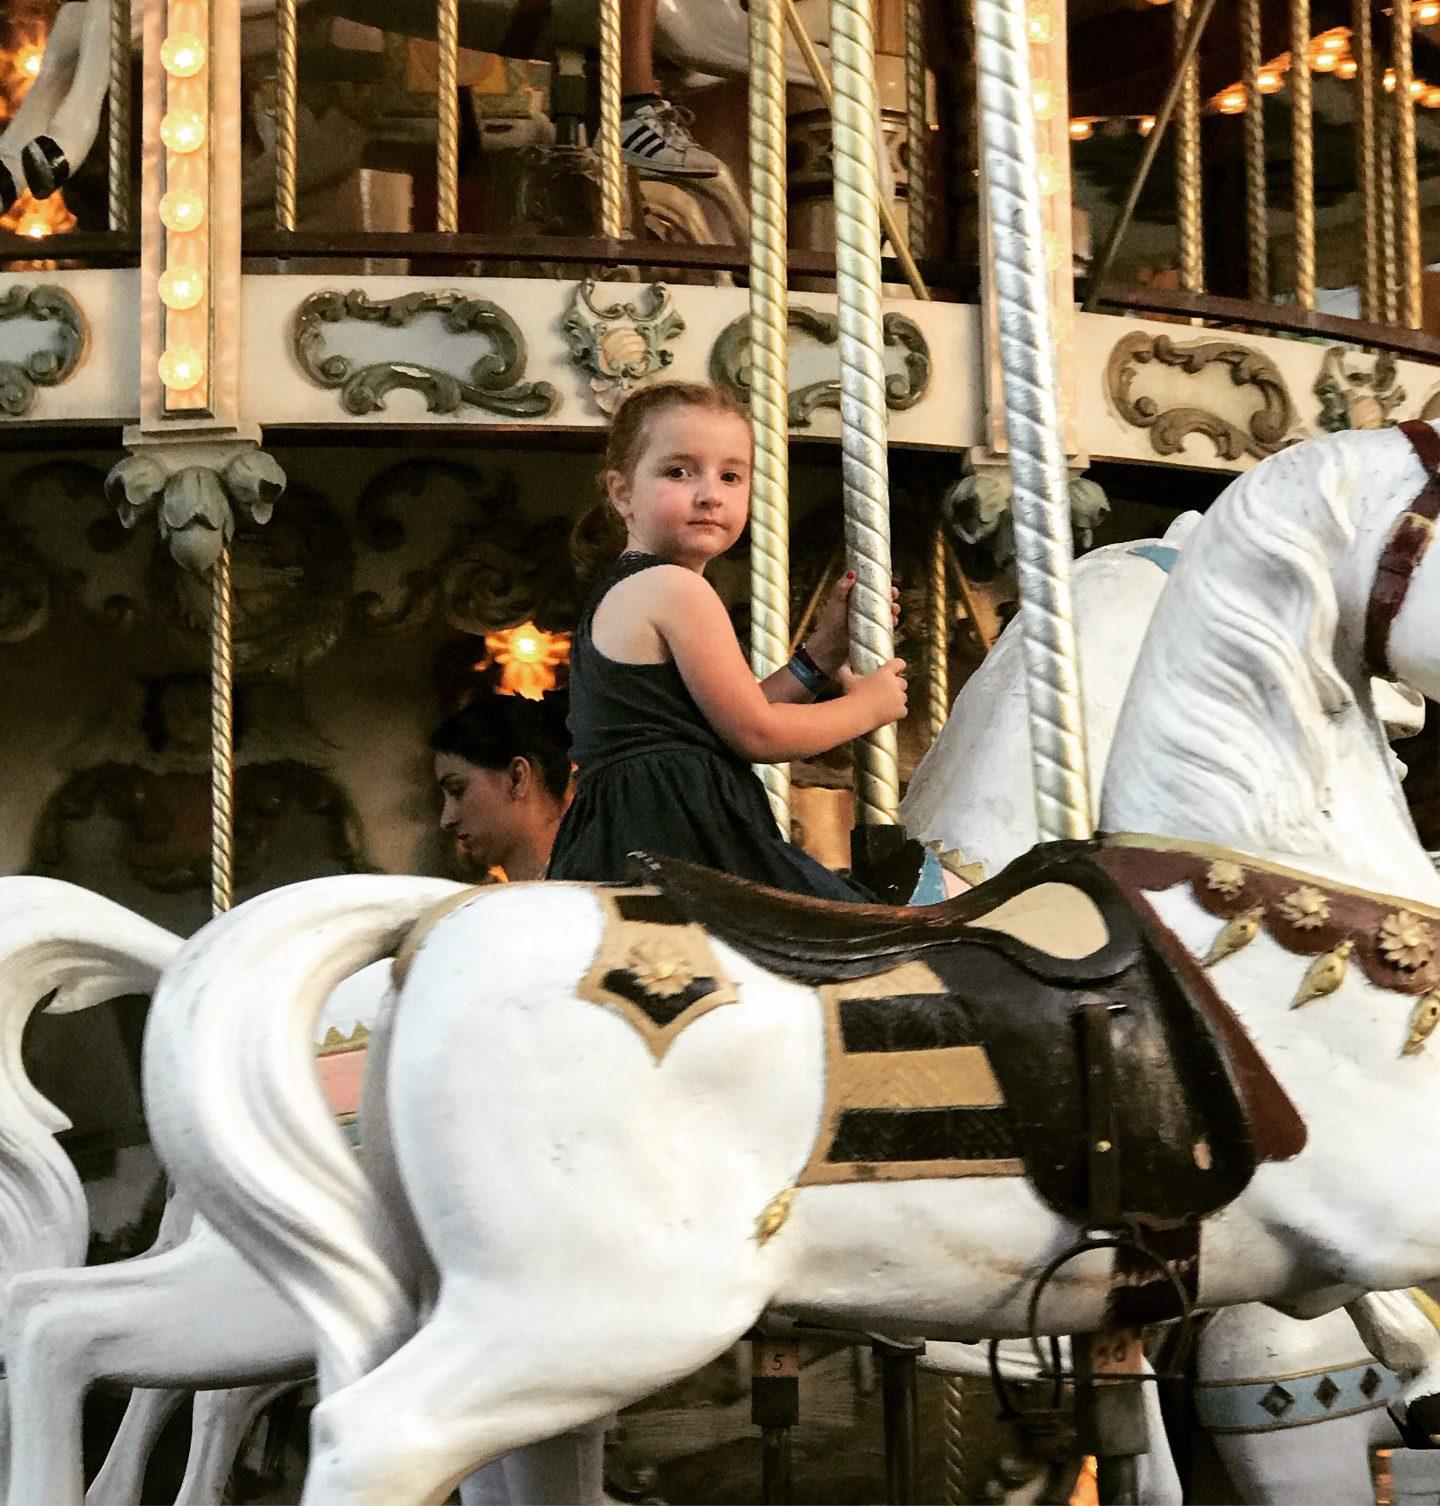 #LivingArrows - Carousel Kids 34/53 (2018)